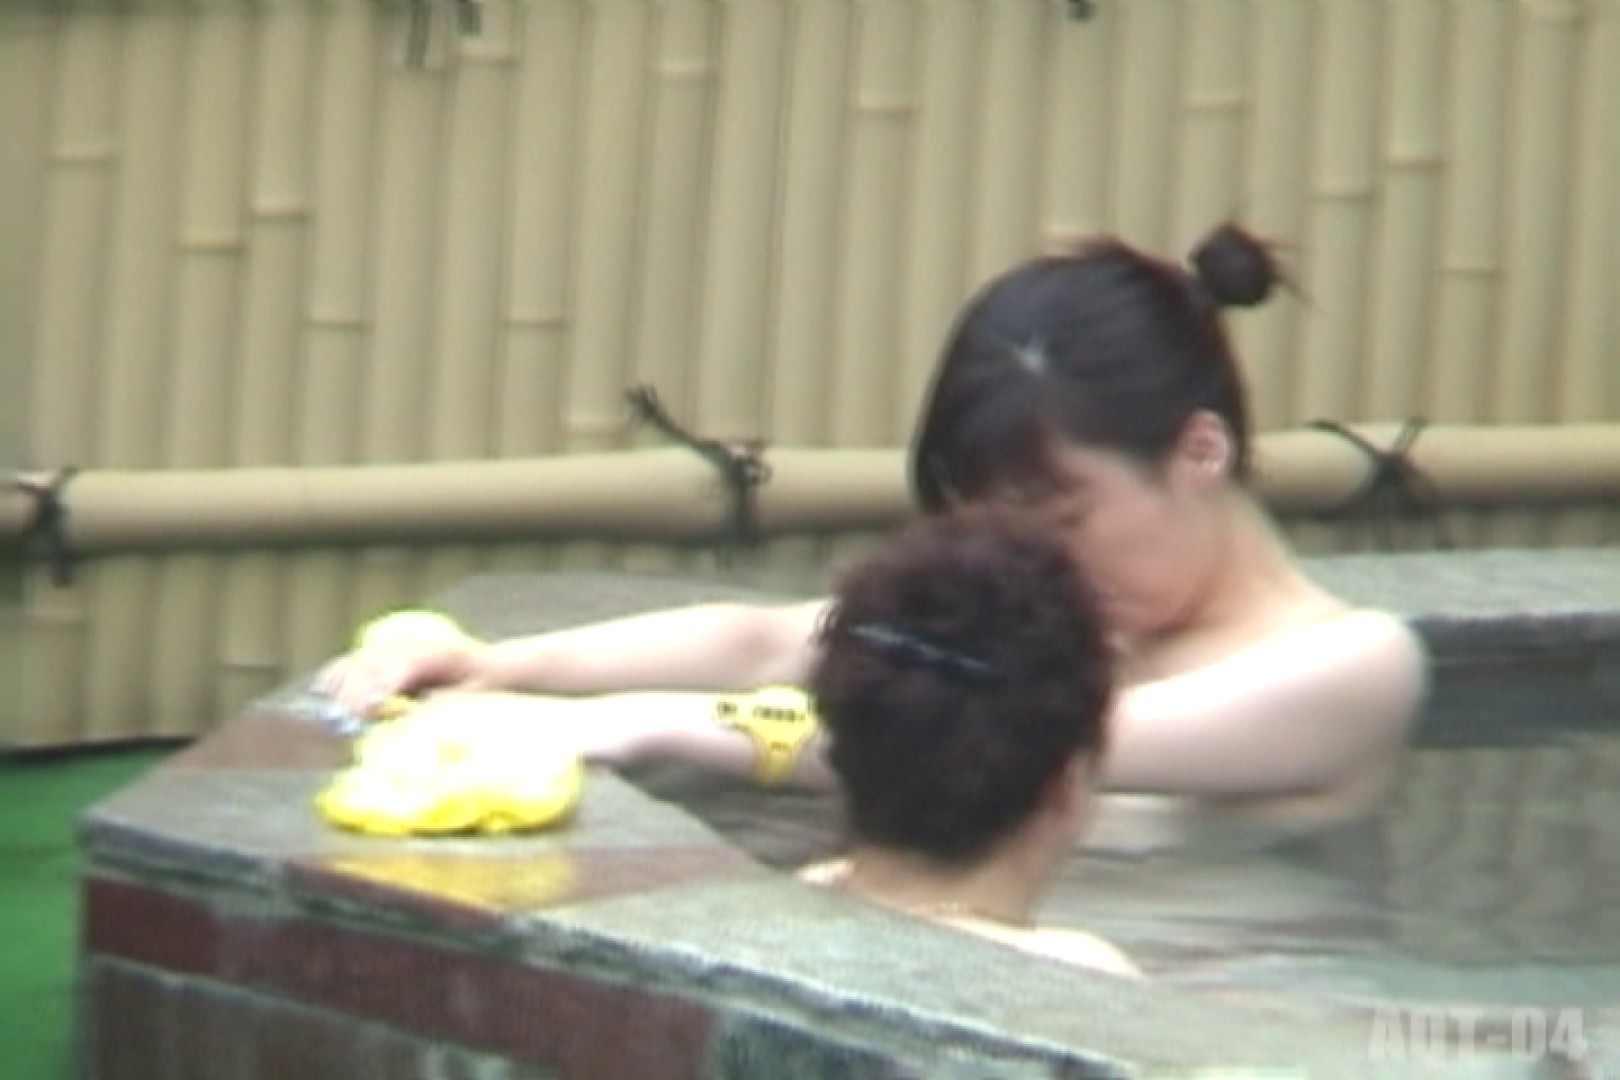 Aquaな露天風呂Vol.743 盗撮映像  75Pix 53